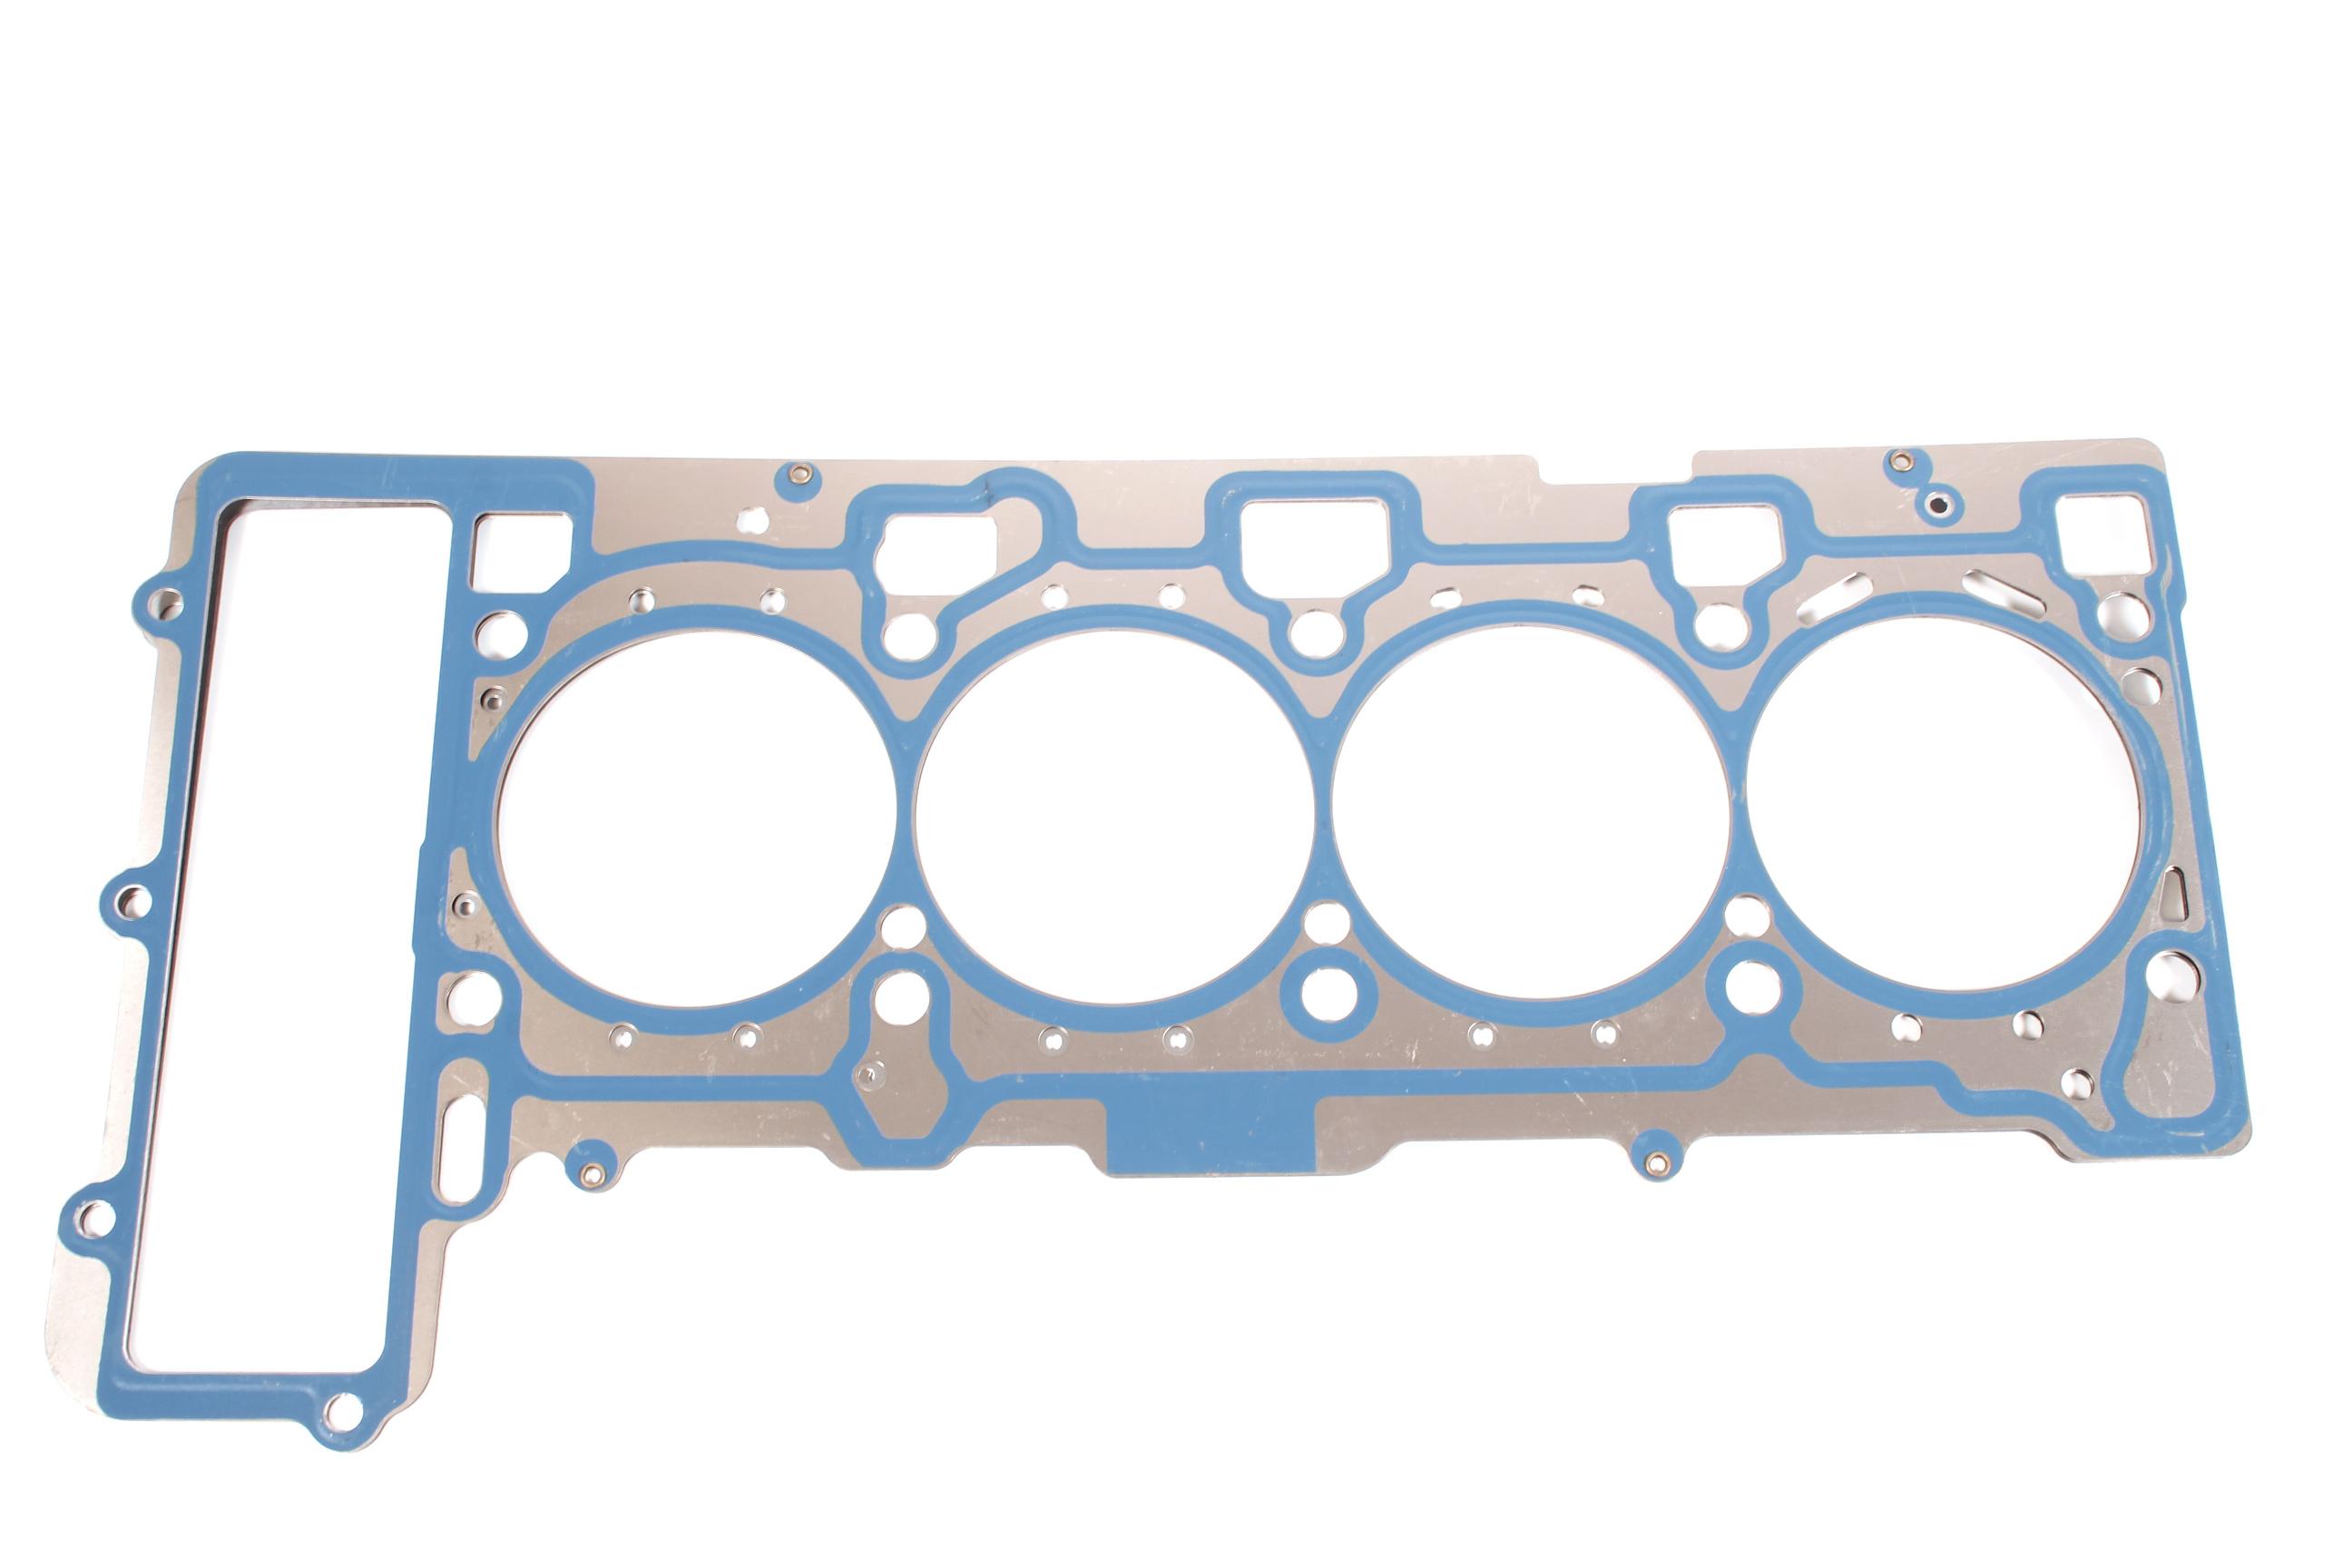 Zylinderkopfdichtung ZKD Audi VW 4,2 FSI BAR CGNA BNS links 079103383AR NEU